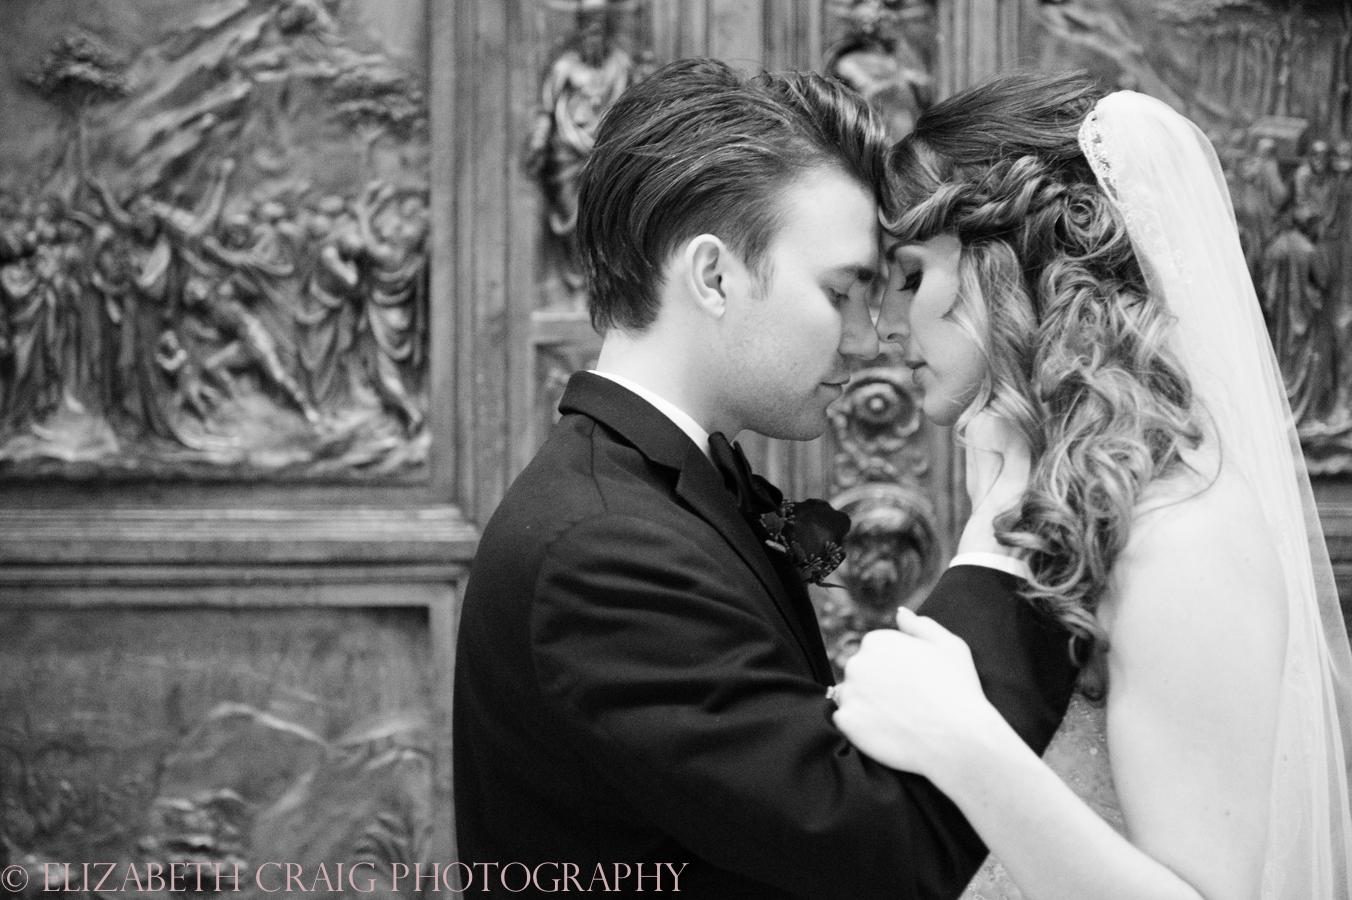 Carnegie Museum of Art Weddings | Elizabeth Craig Photography-0089